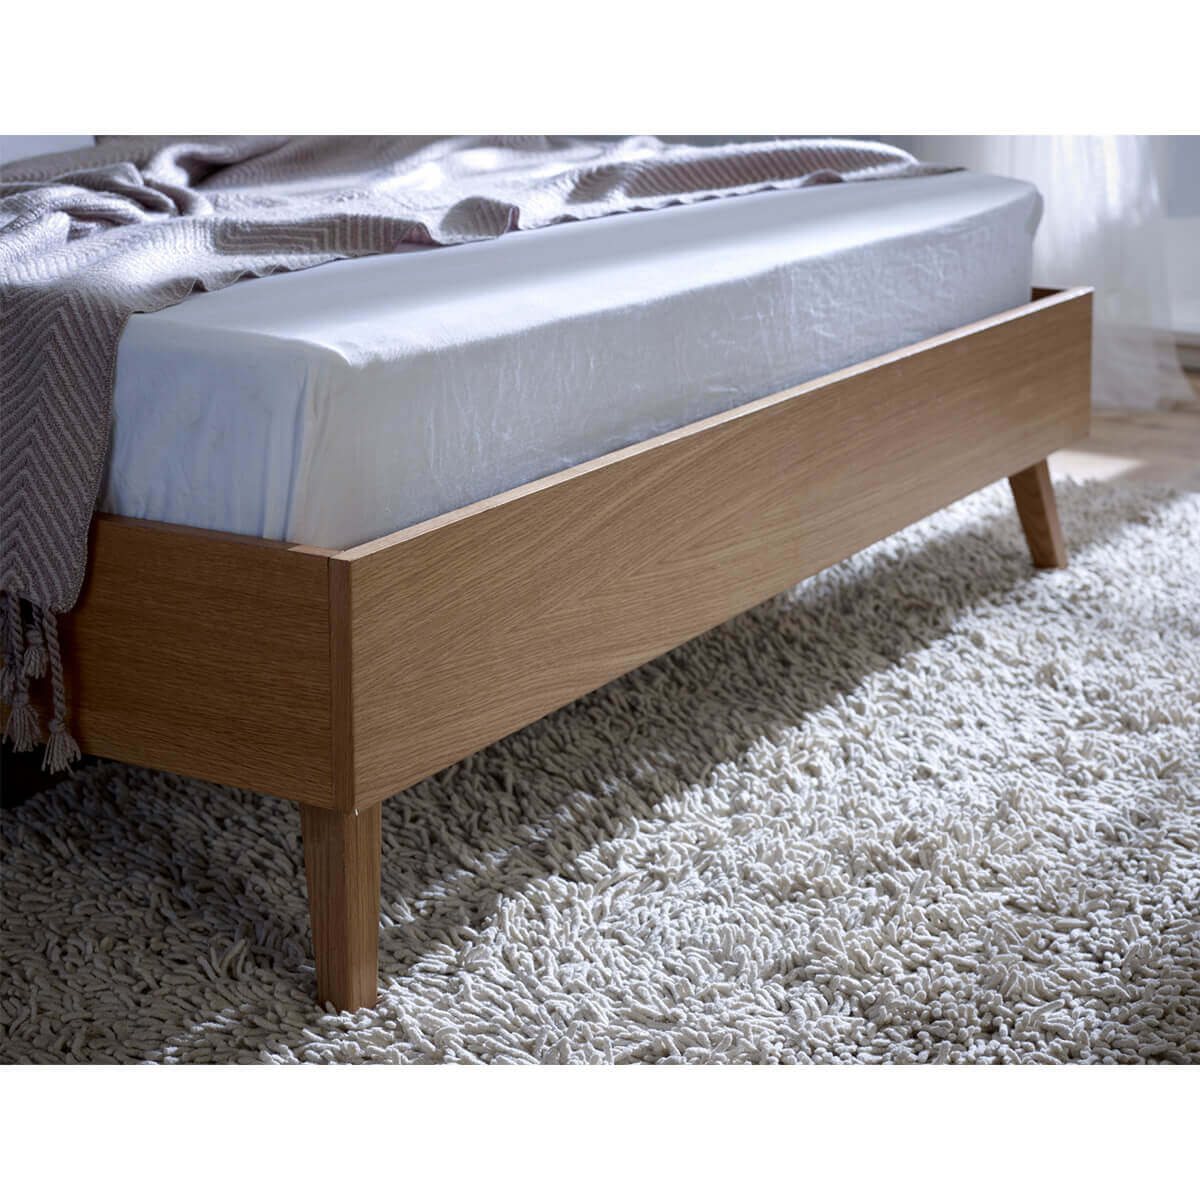 Bianca Scandinavian Bed Frame Natural Fabric & Solid Oak 4